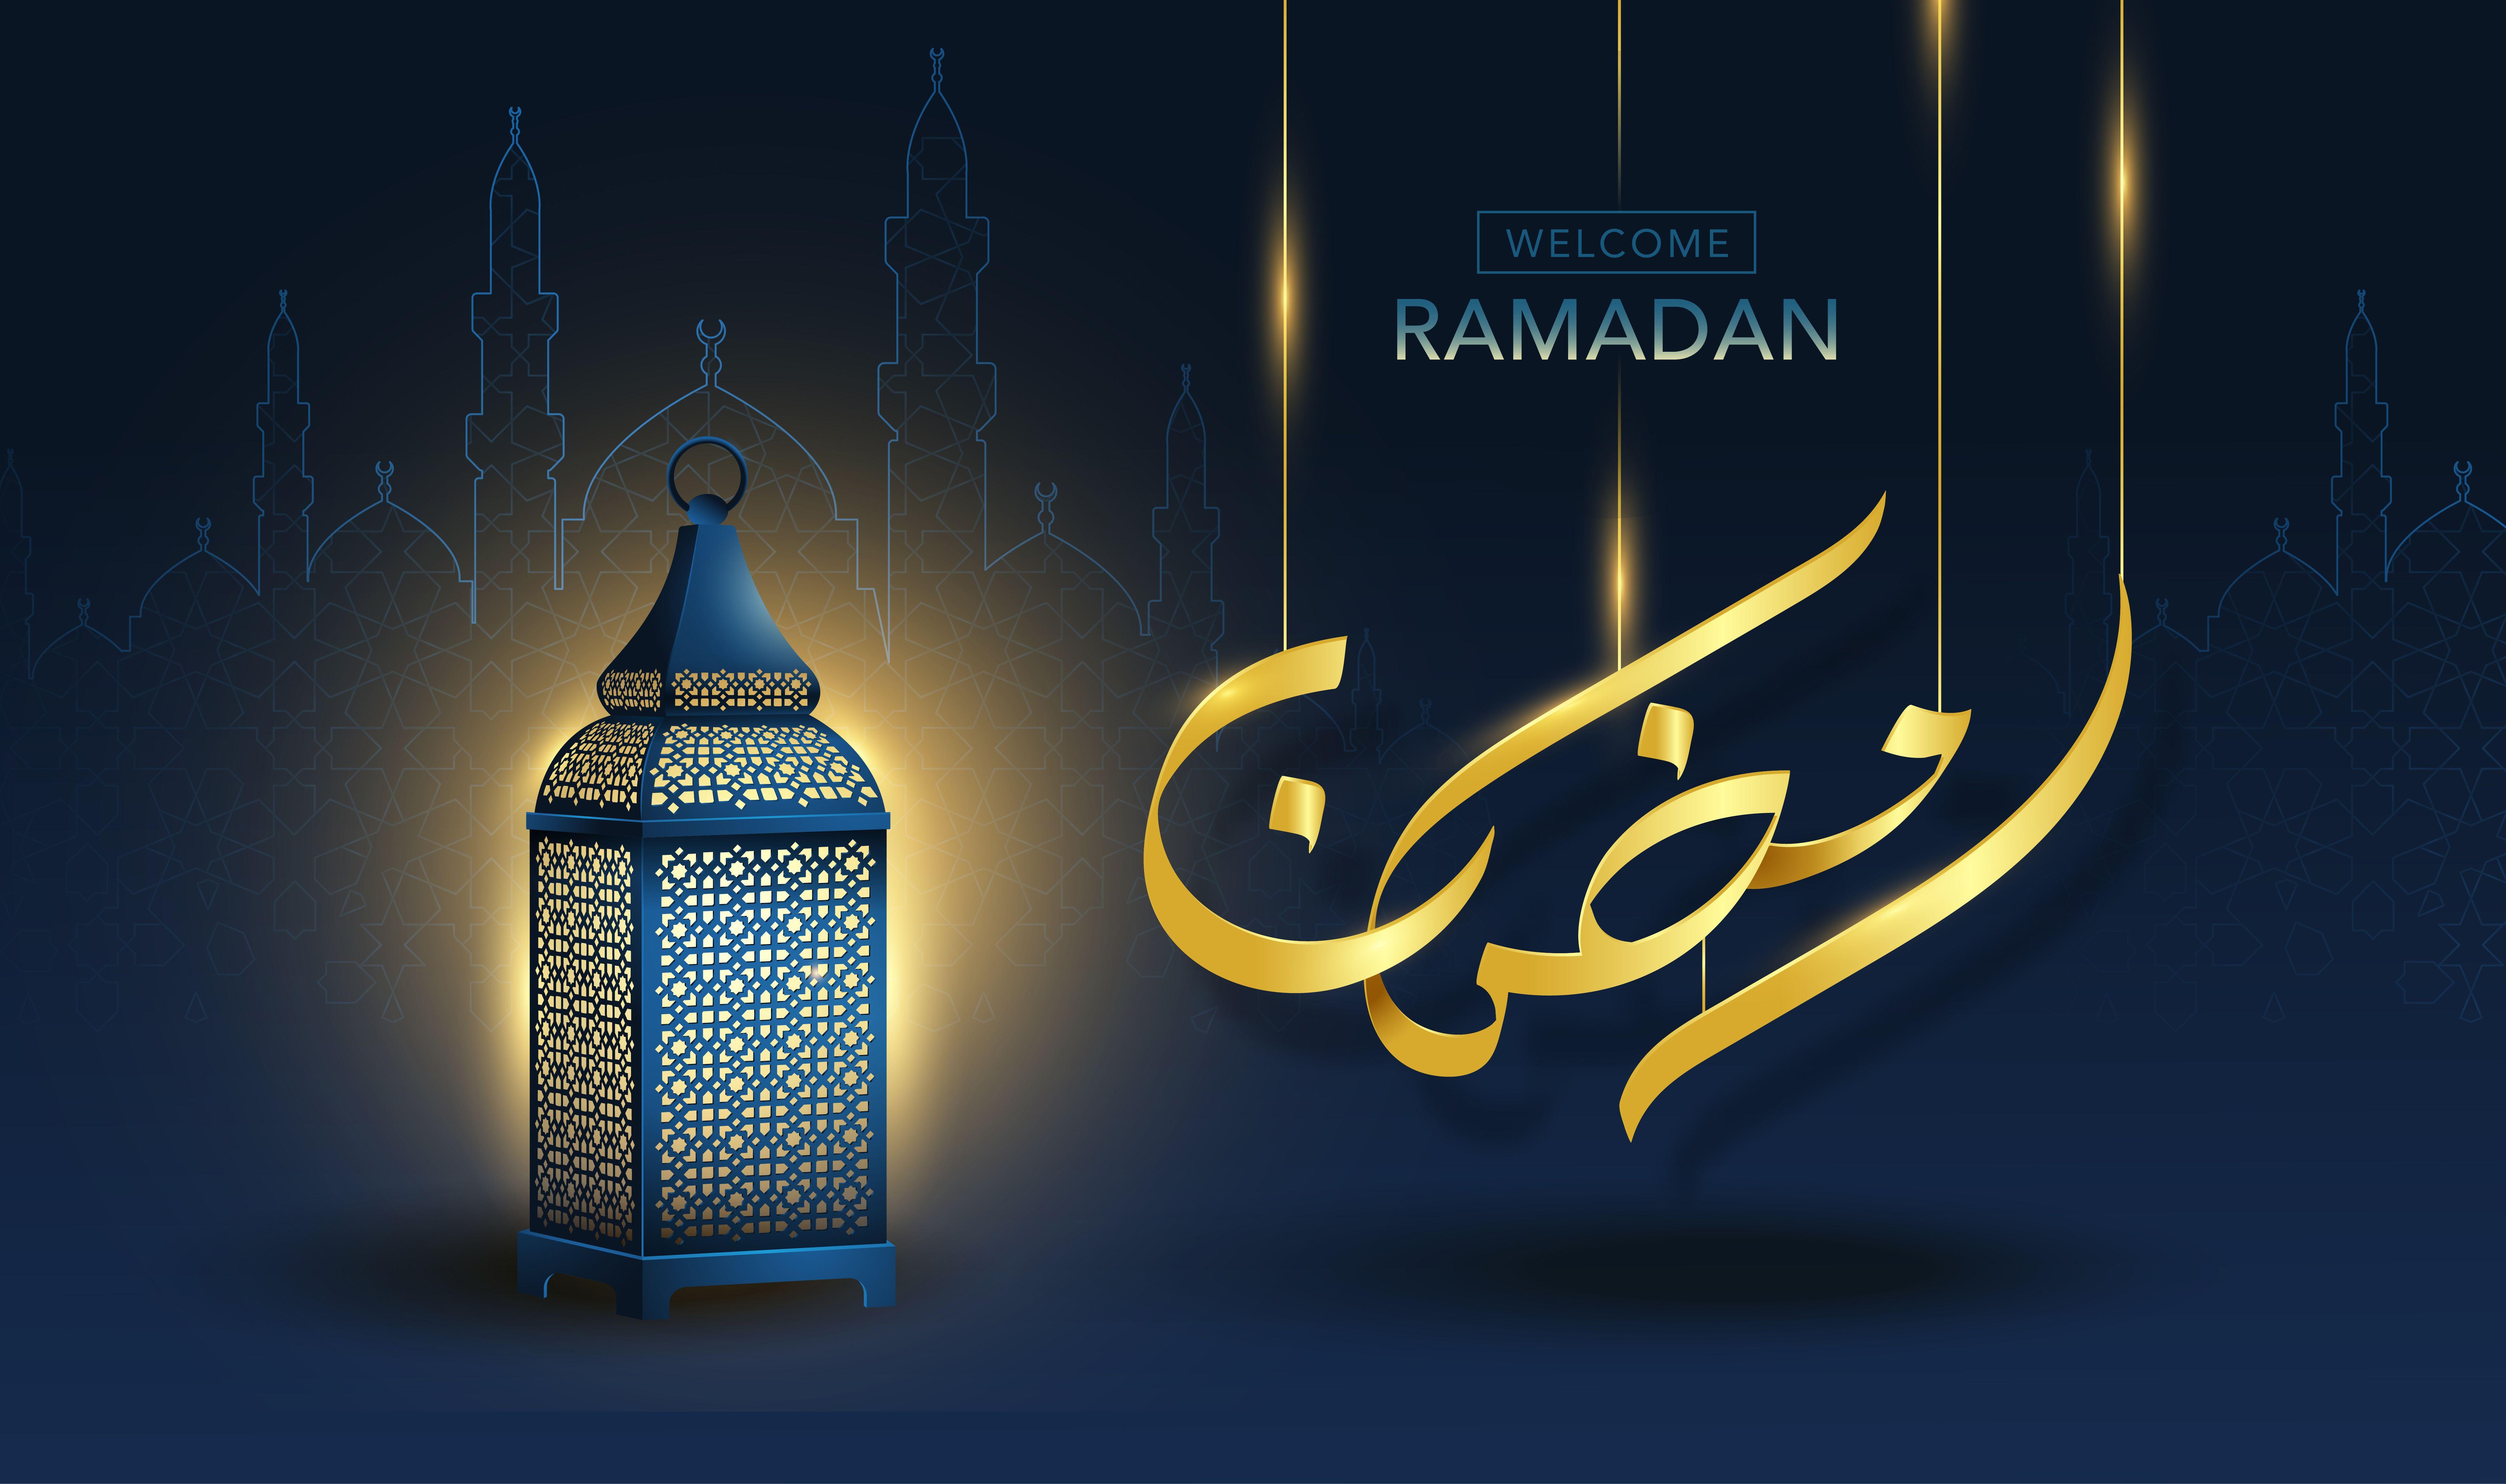 Welcome Ramadan Gold Calligraphy With Vintage Arabic Lantern On